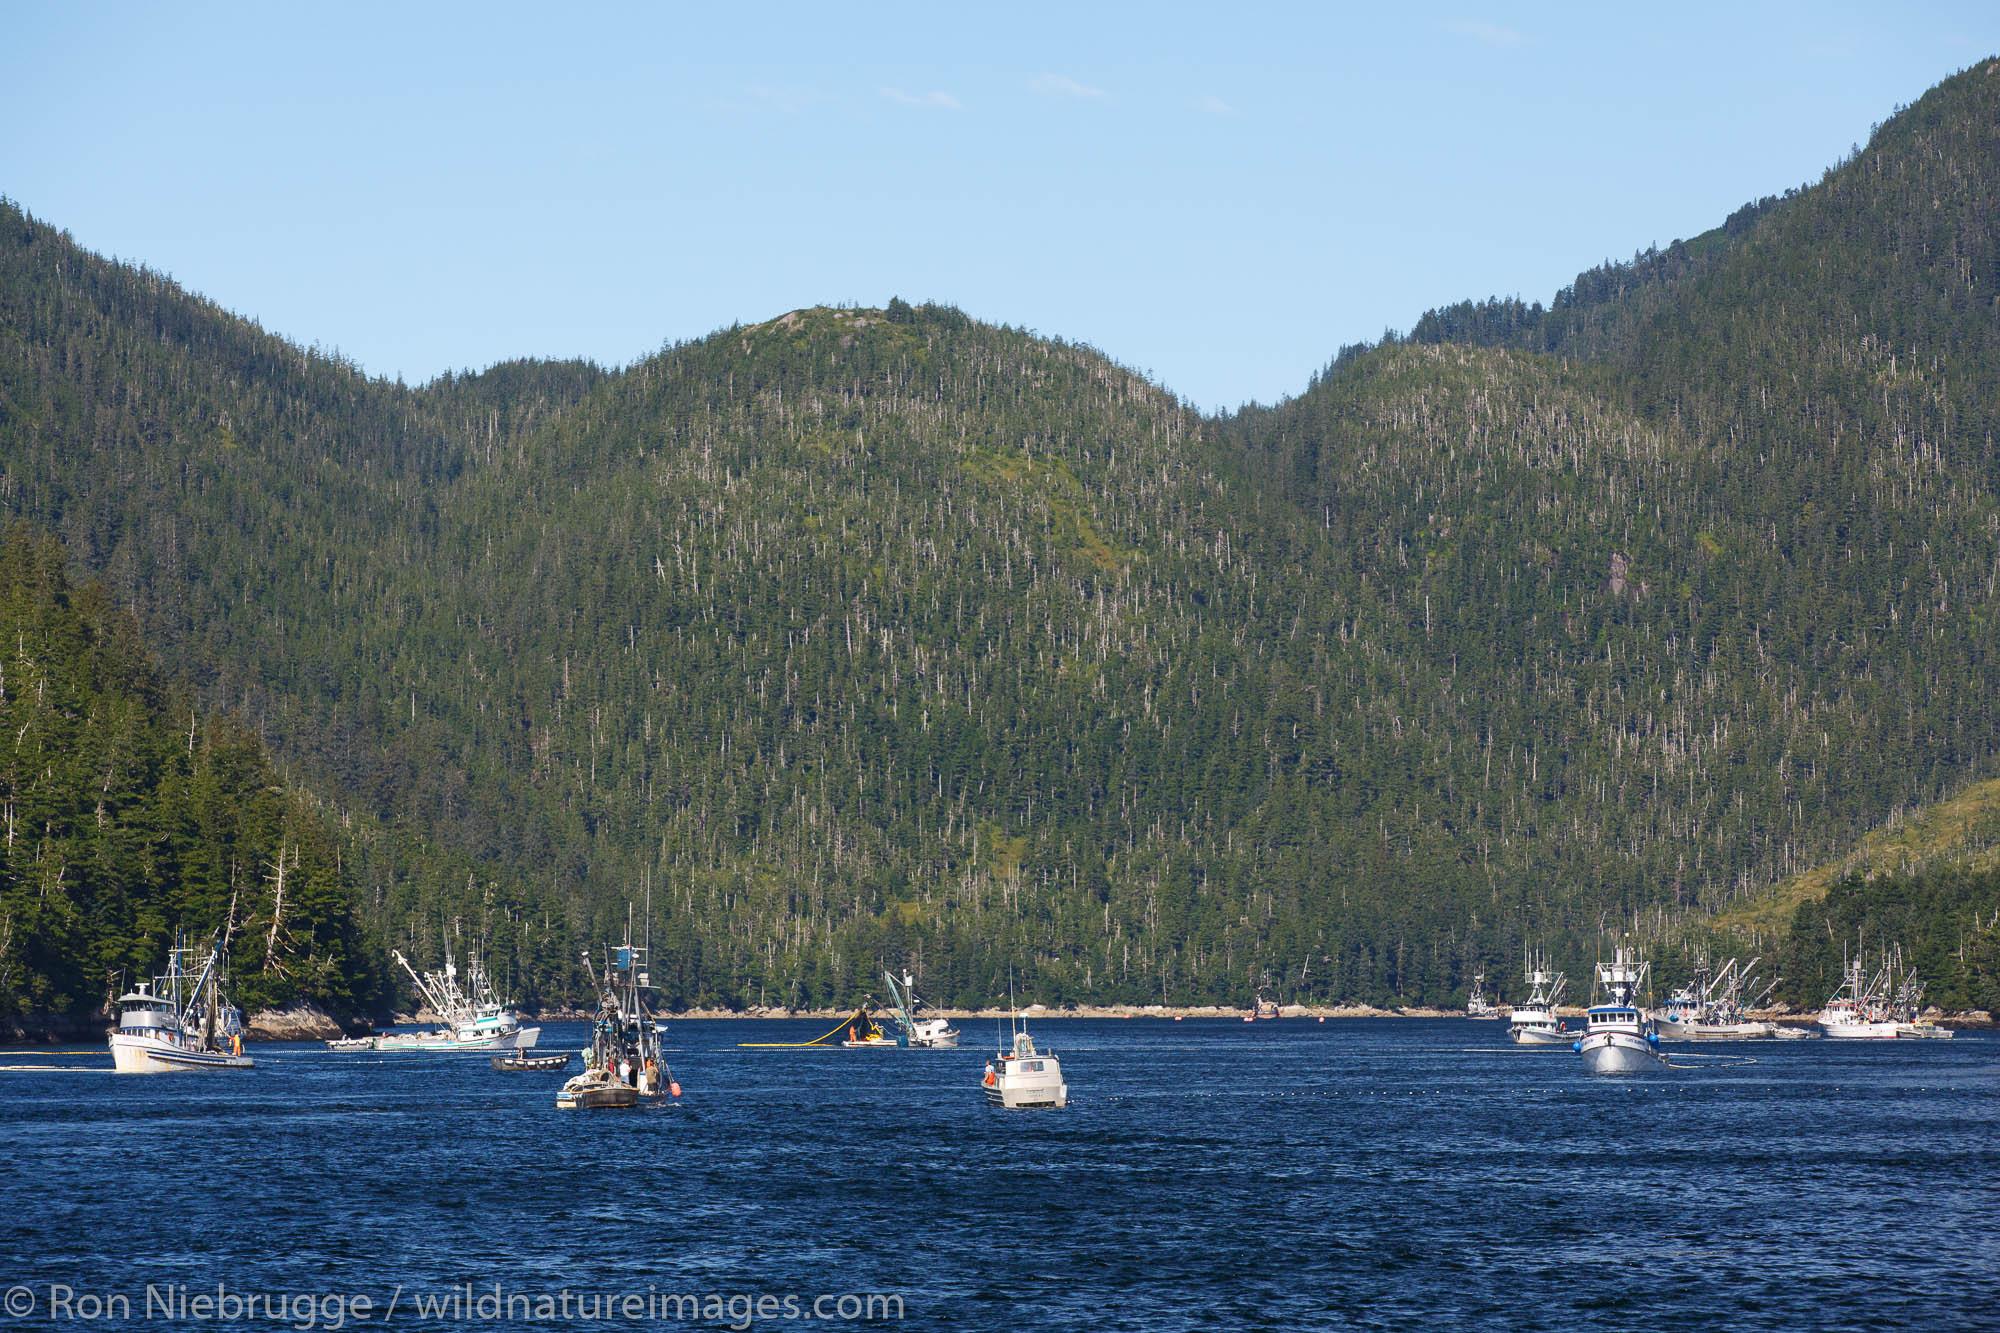 Commercial salmon fishing, Prince William Sound, Chugach National Forest, Alaska